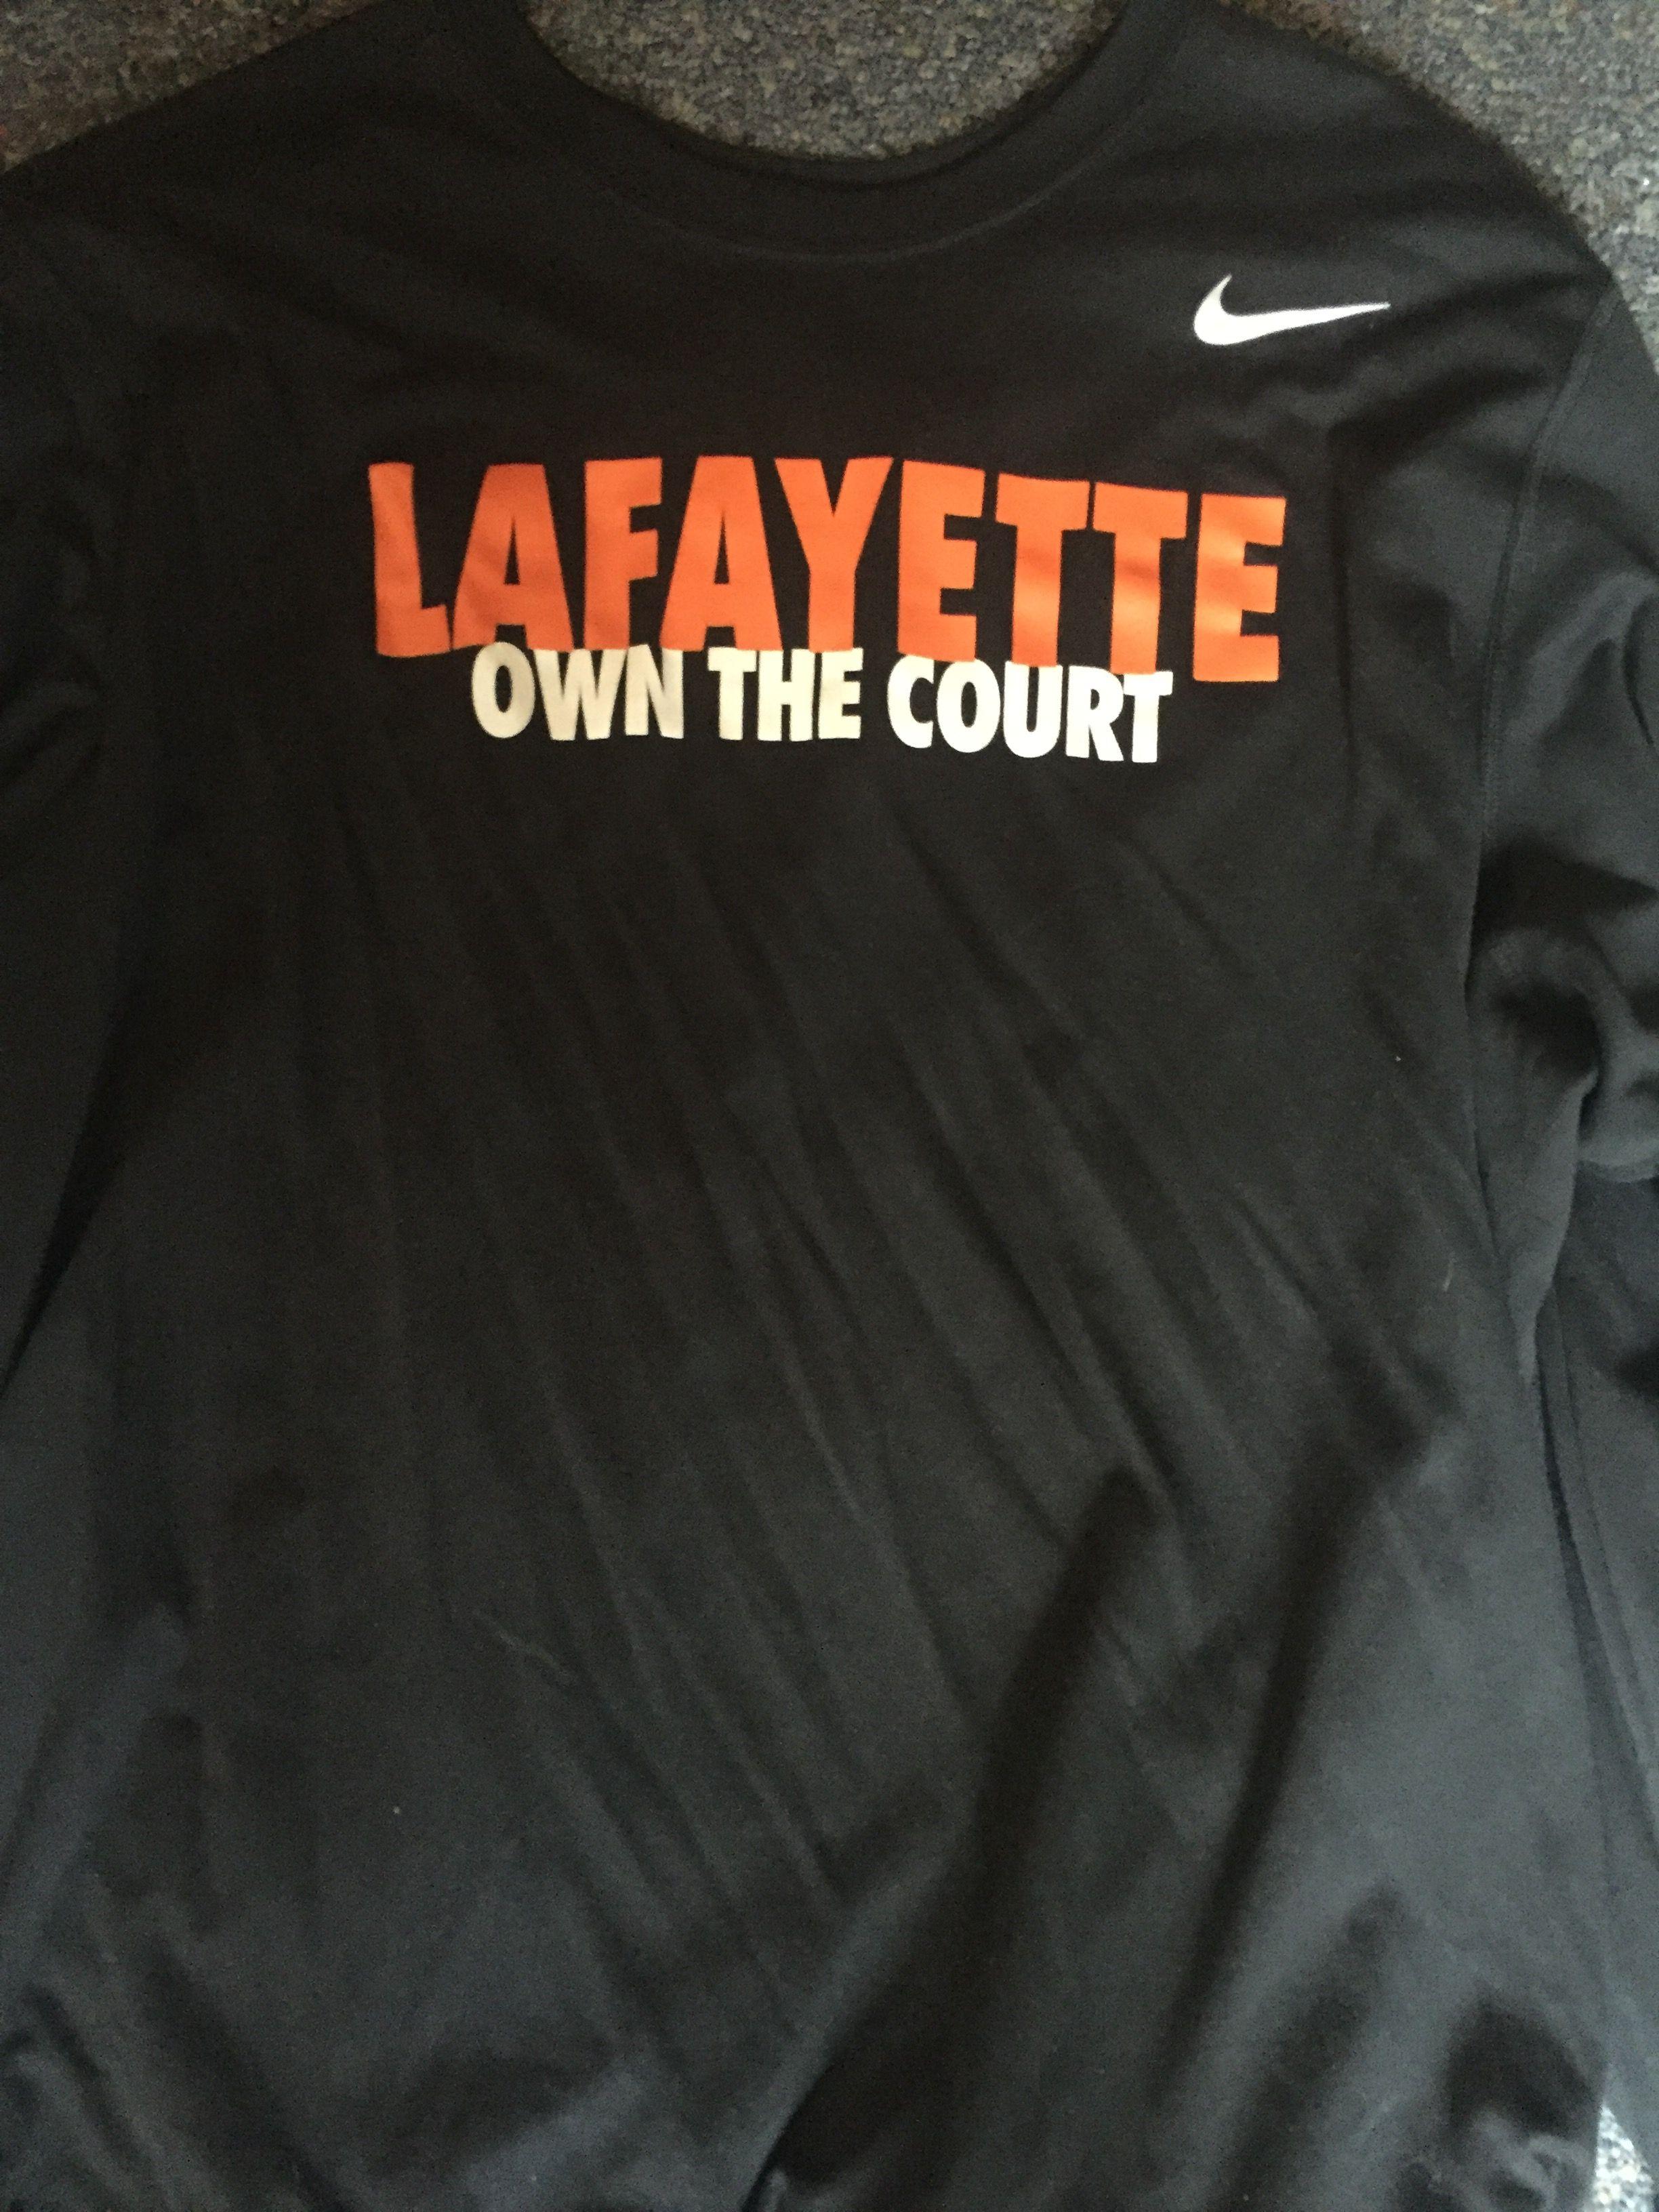 High School Basketball Shirts - BCD Tofu House 8579ead4b